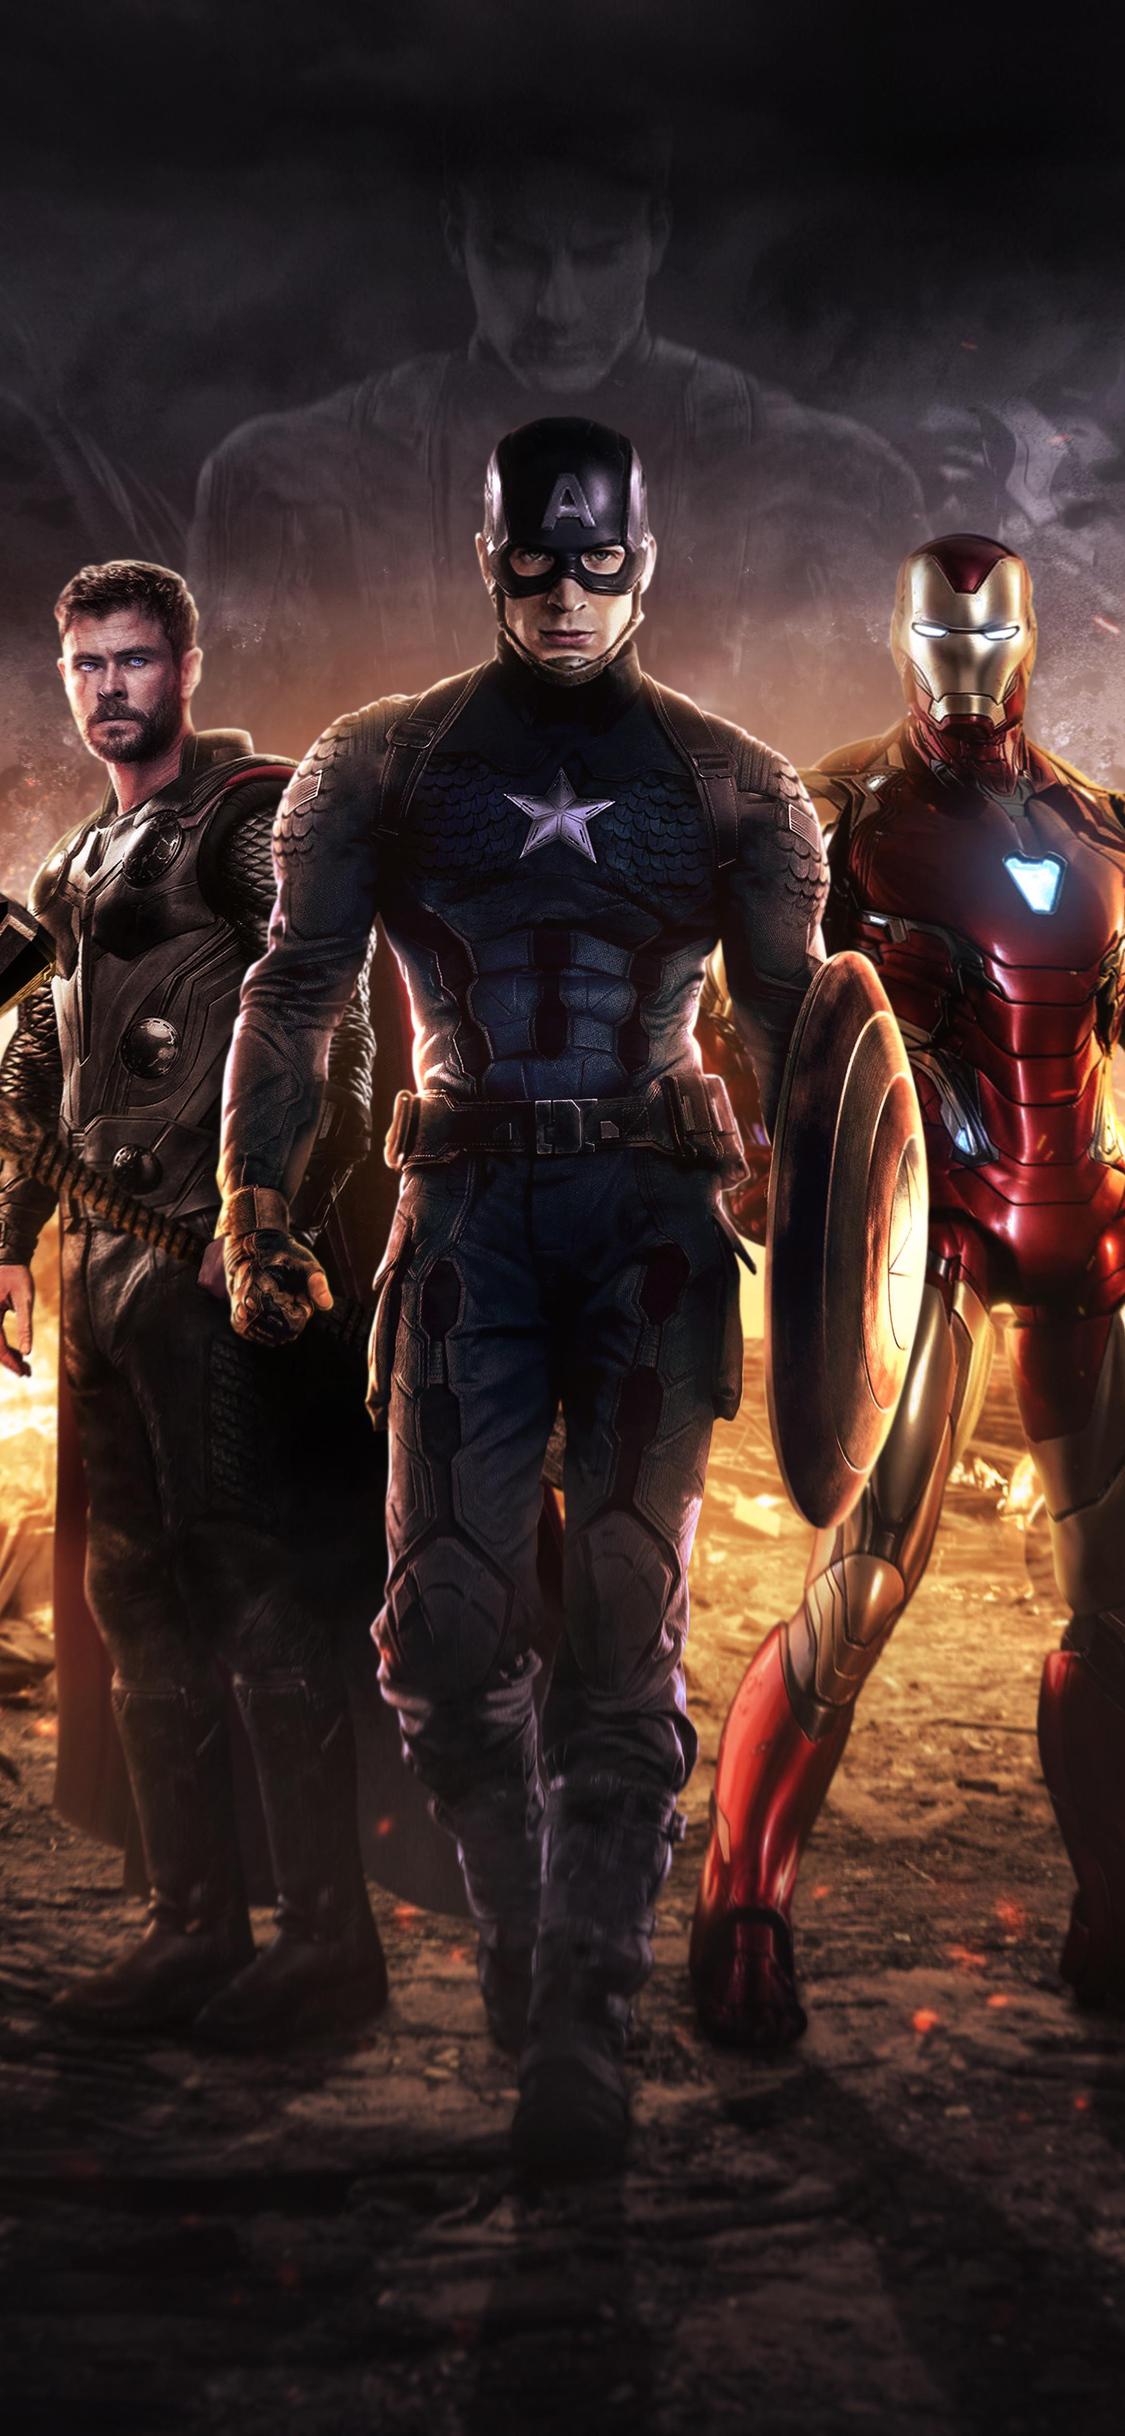 1125x2436 Avengers Endgame 4k 2019 Iphone Xs Iphone 10 Iphone X Hd